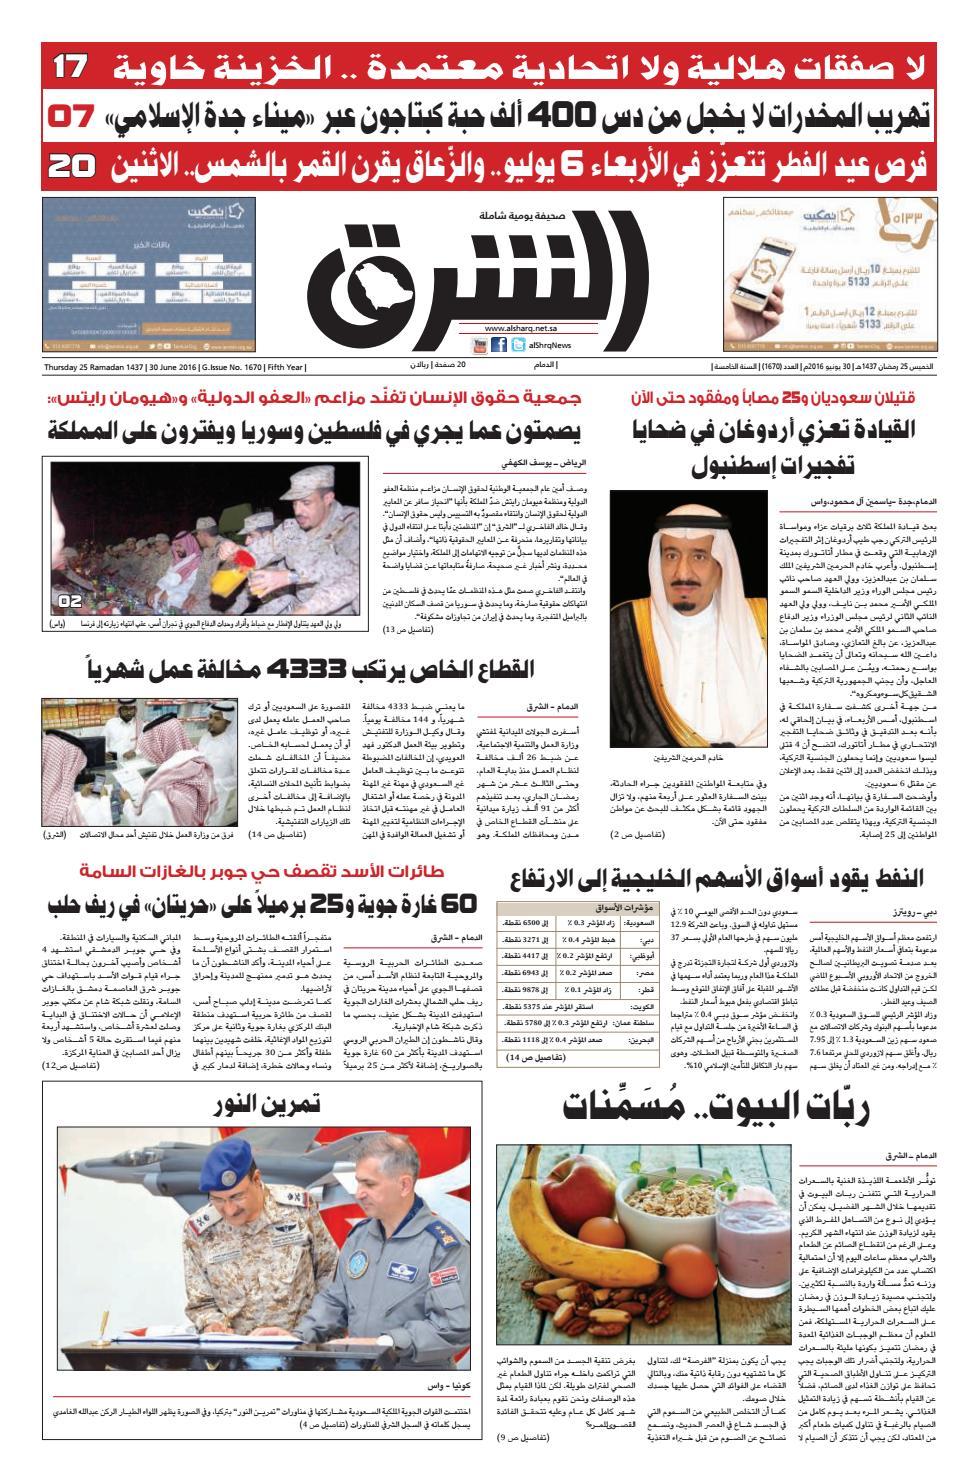 da7ff7749 صحيفة الشرق - العدد 1670 - نسخة الدمام by صحيفة الشرق السعودية - issuu